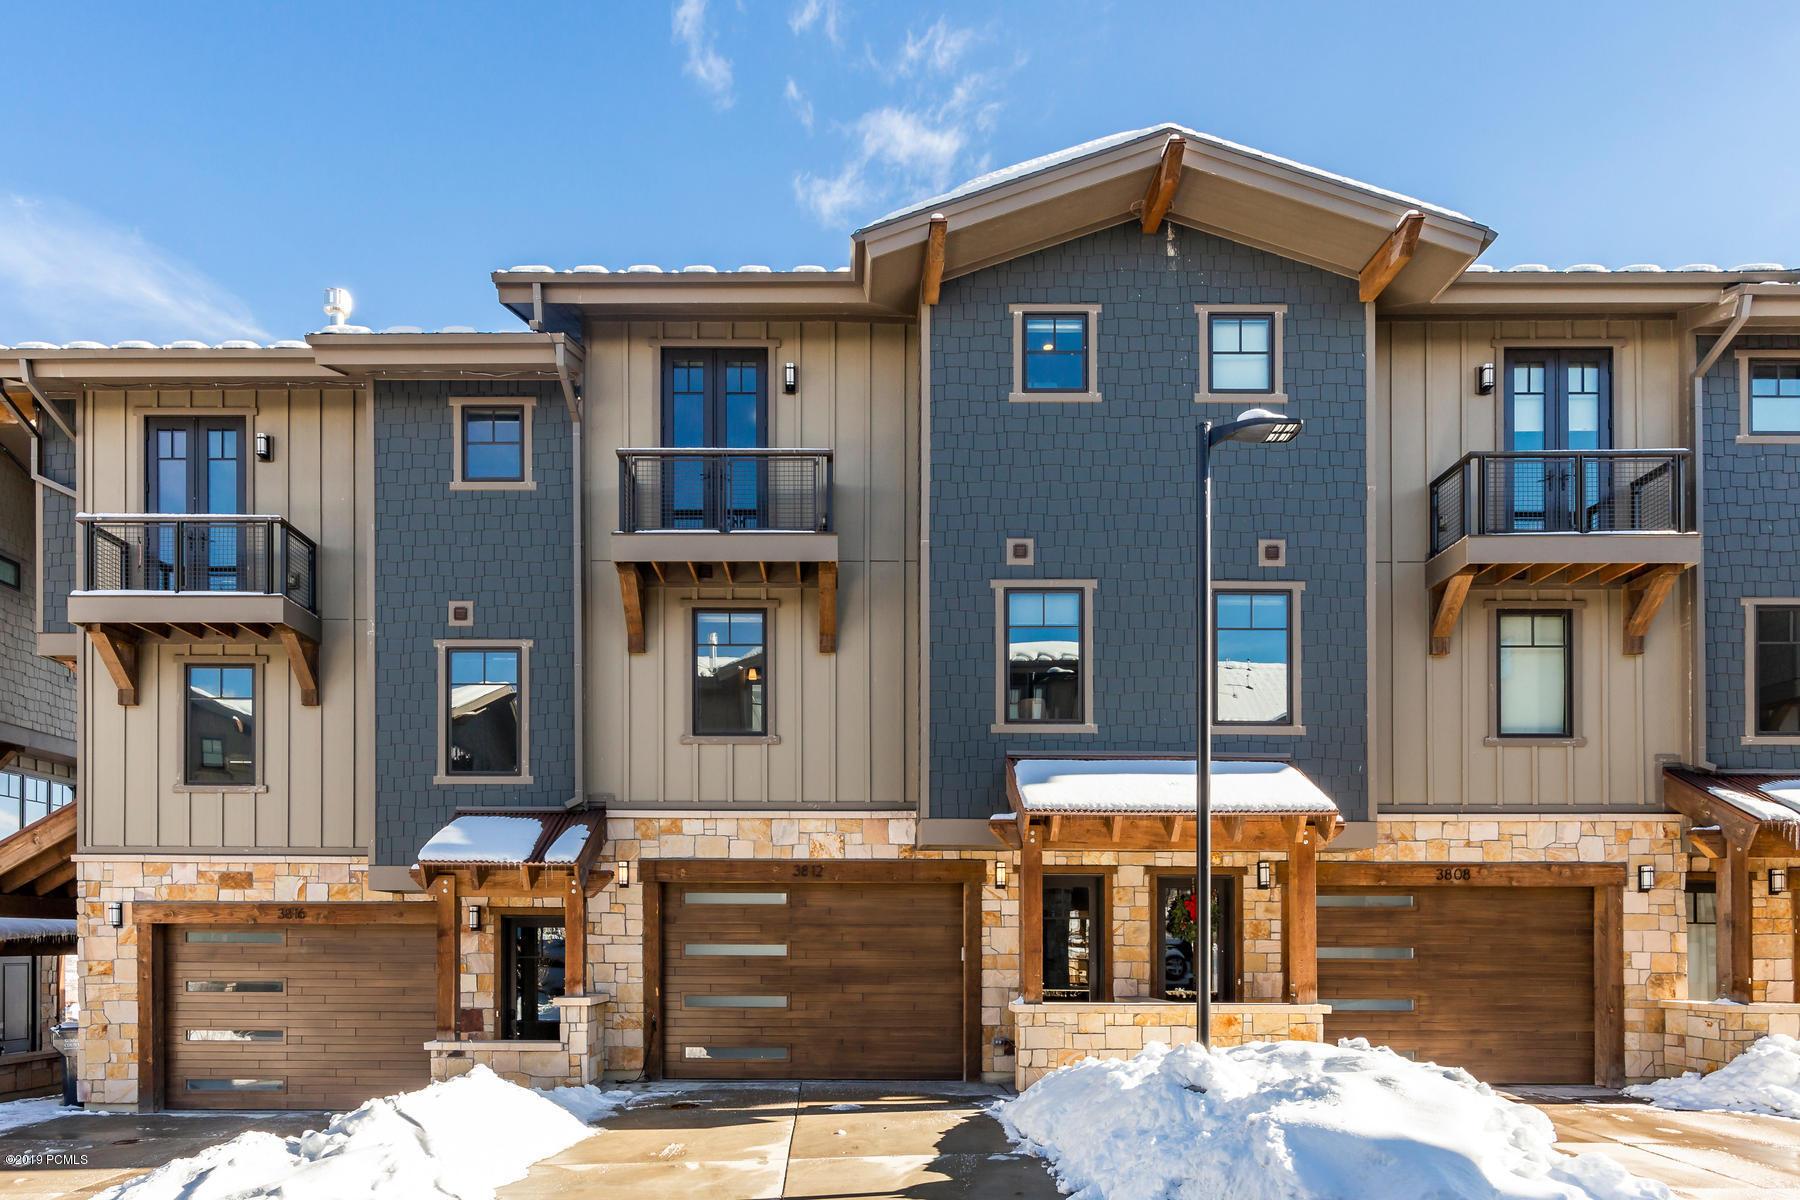 3812 Blackstone Drive, Park City, Utah 84098, 3 Bedrooms Bedrooms, ,3 BathroomsBathrooms,Condominium,For Sale,Blackstone,20190109112430415765000000